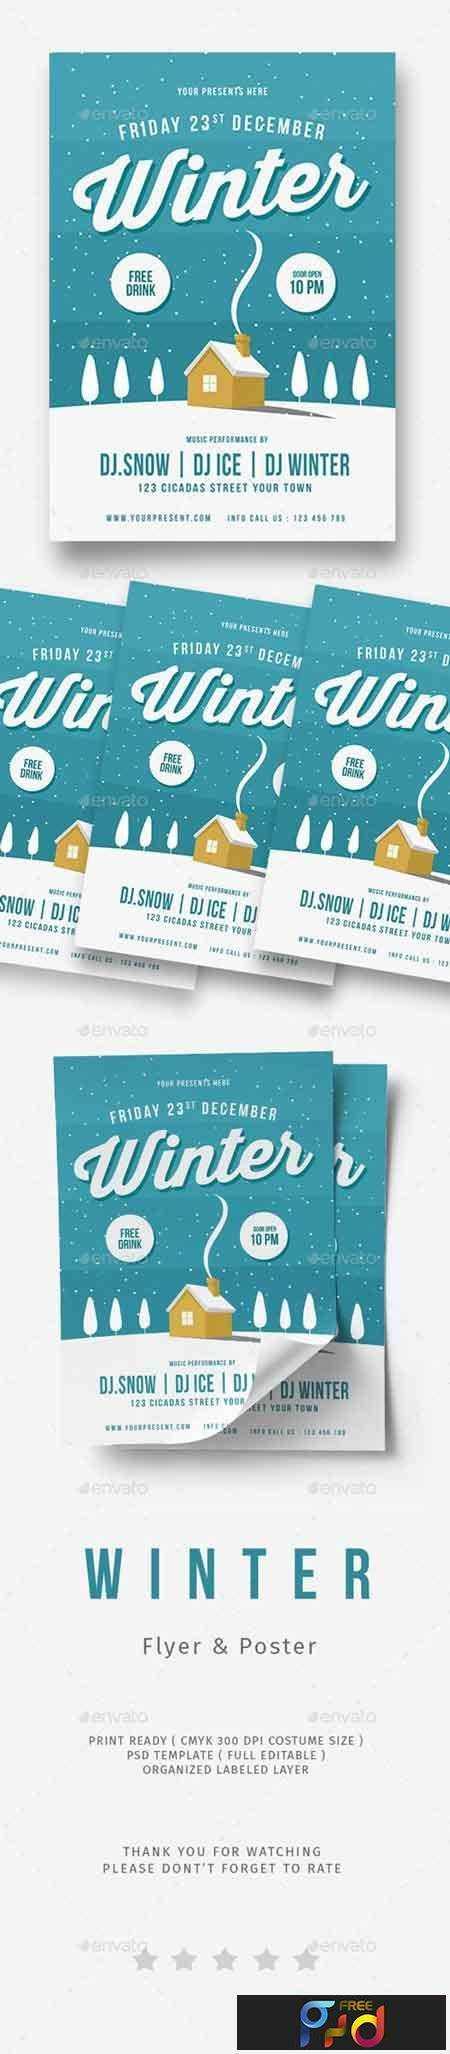 1707127 Winter Flyer 20899762 1